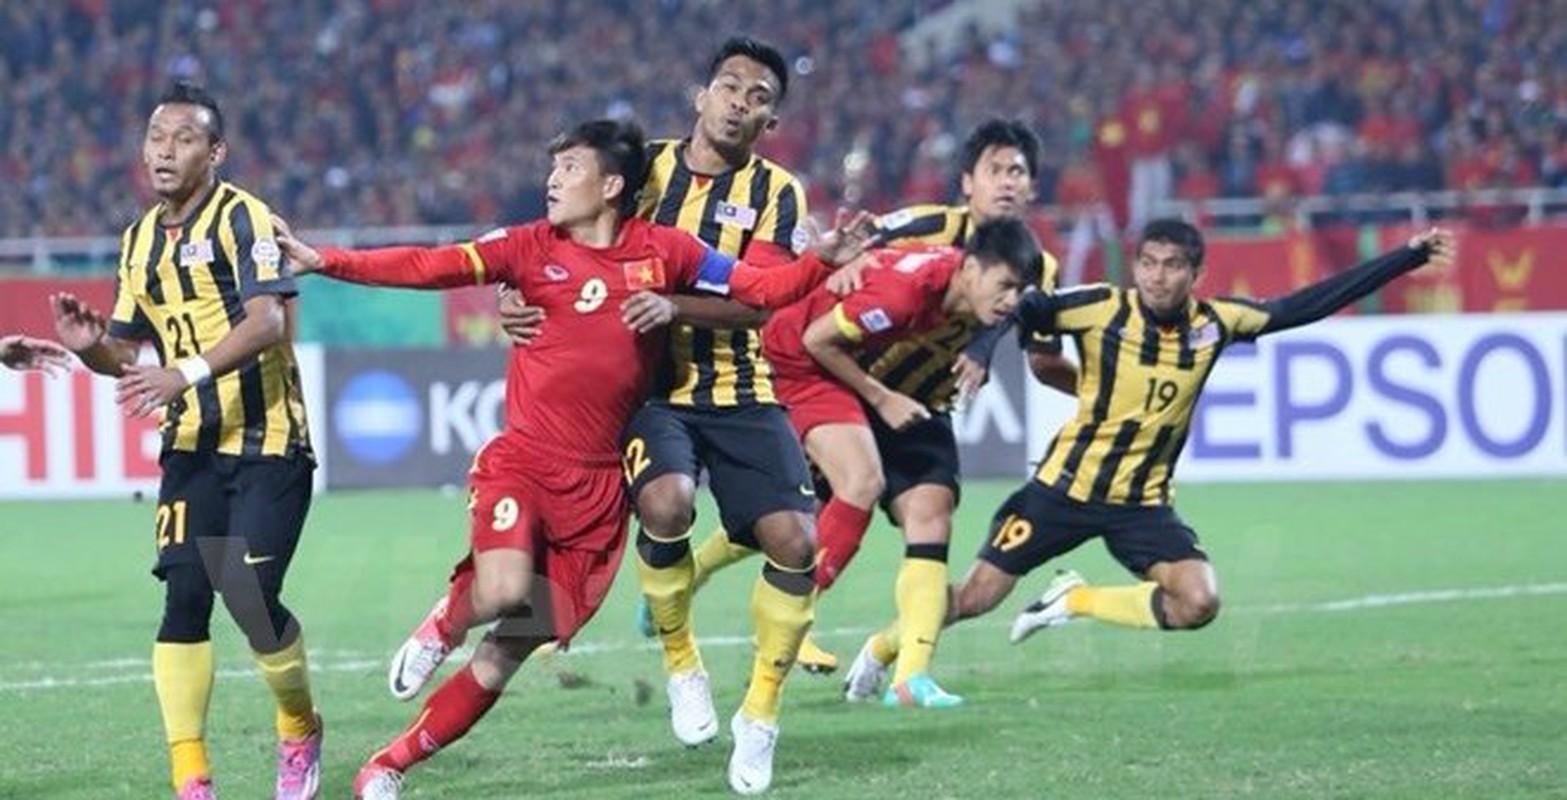 My Dinh va nhung tran ban ket AFF Cup dang quen cua DT Viet Nam-Hinh-5